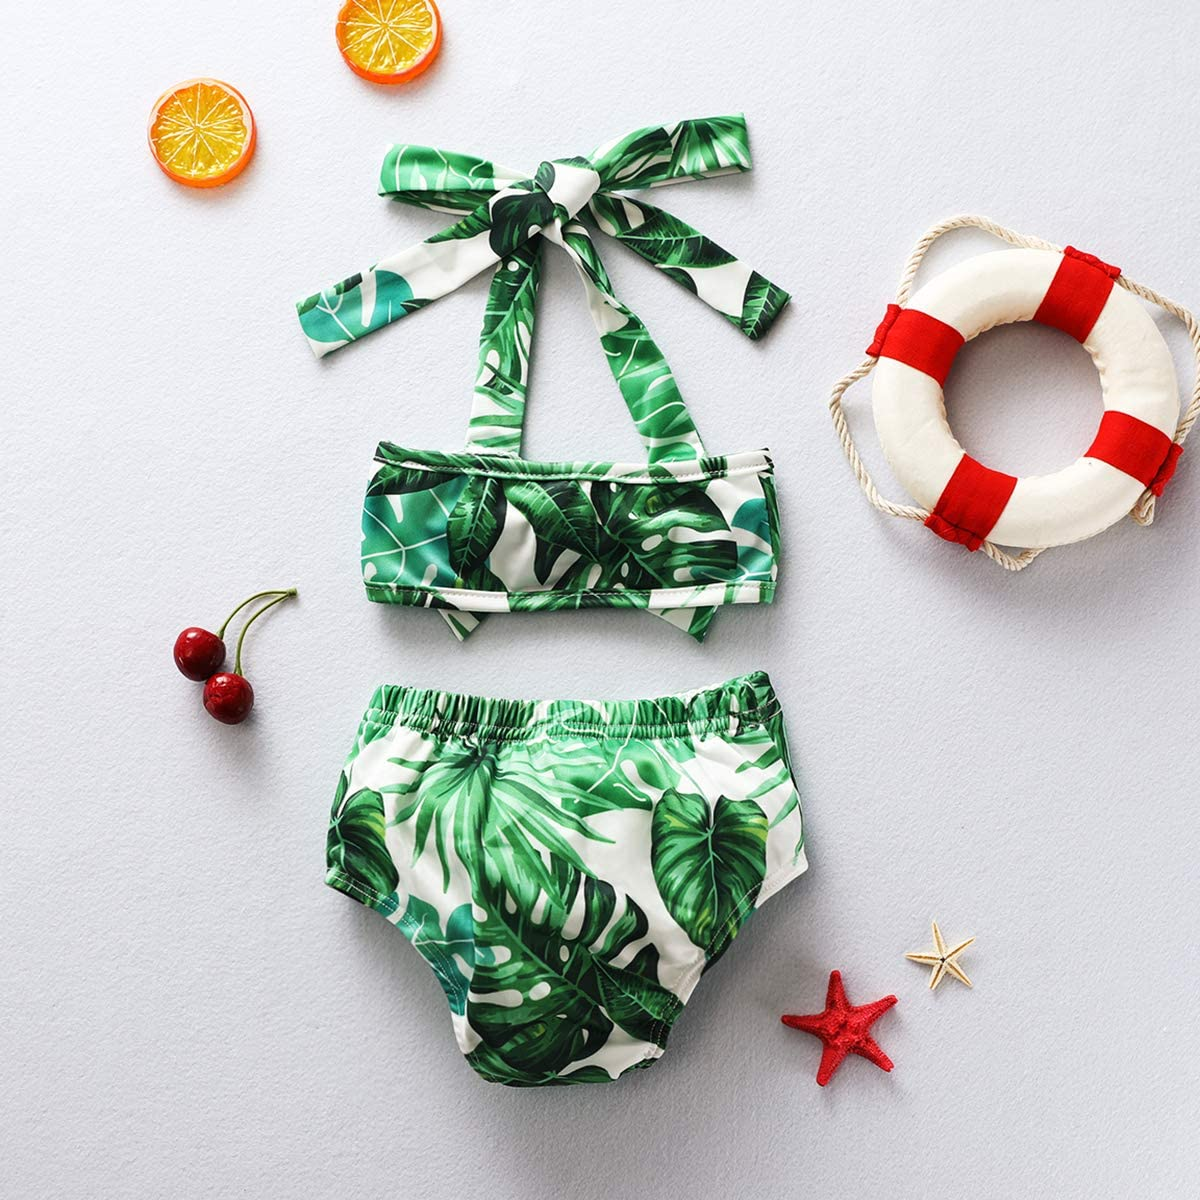 Toddler Baby Girls Bikini Swimsuit Set Sunflower//Green Leaves Two Piece Bathing Suit Halter Top Summer Suit